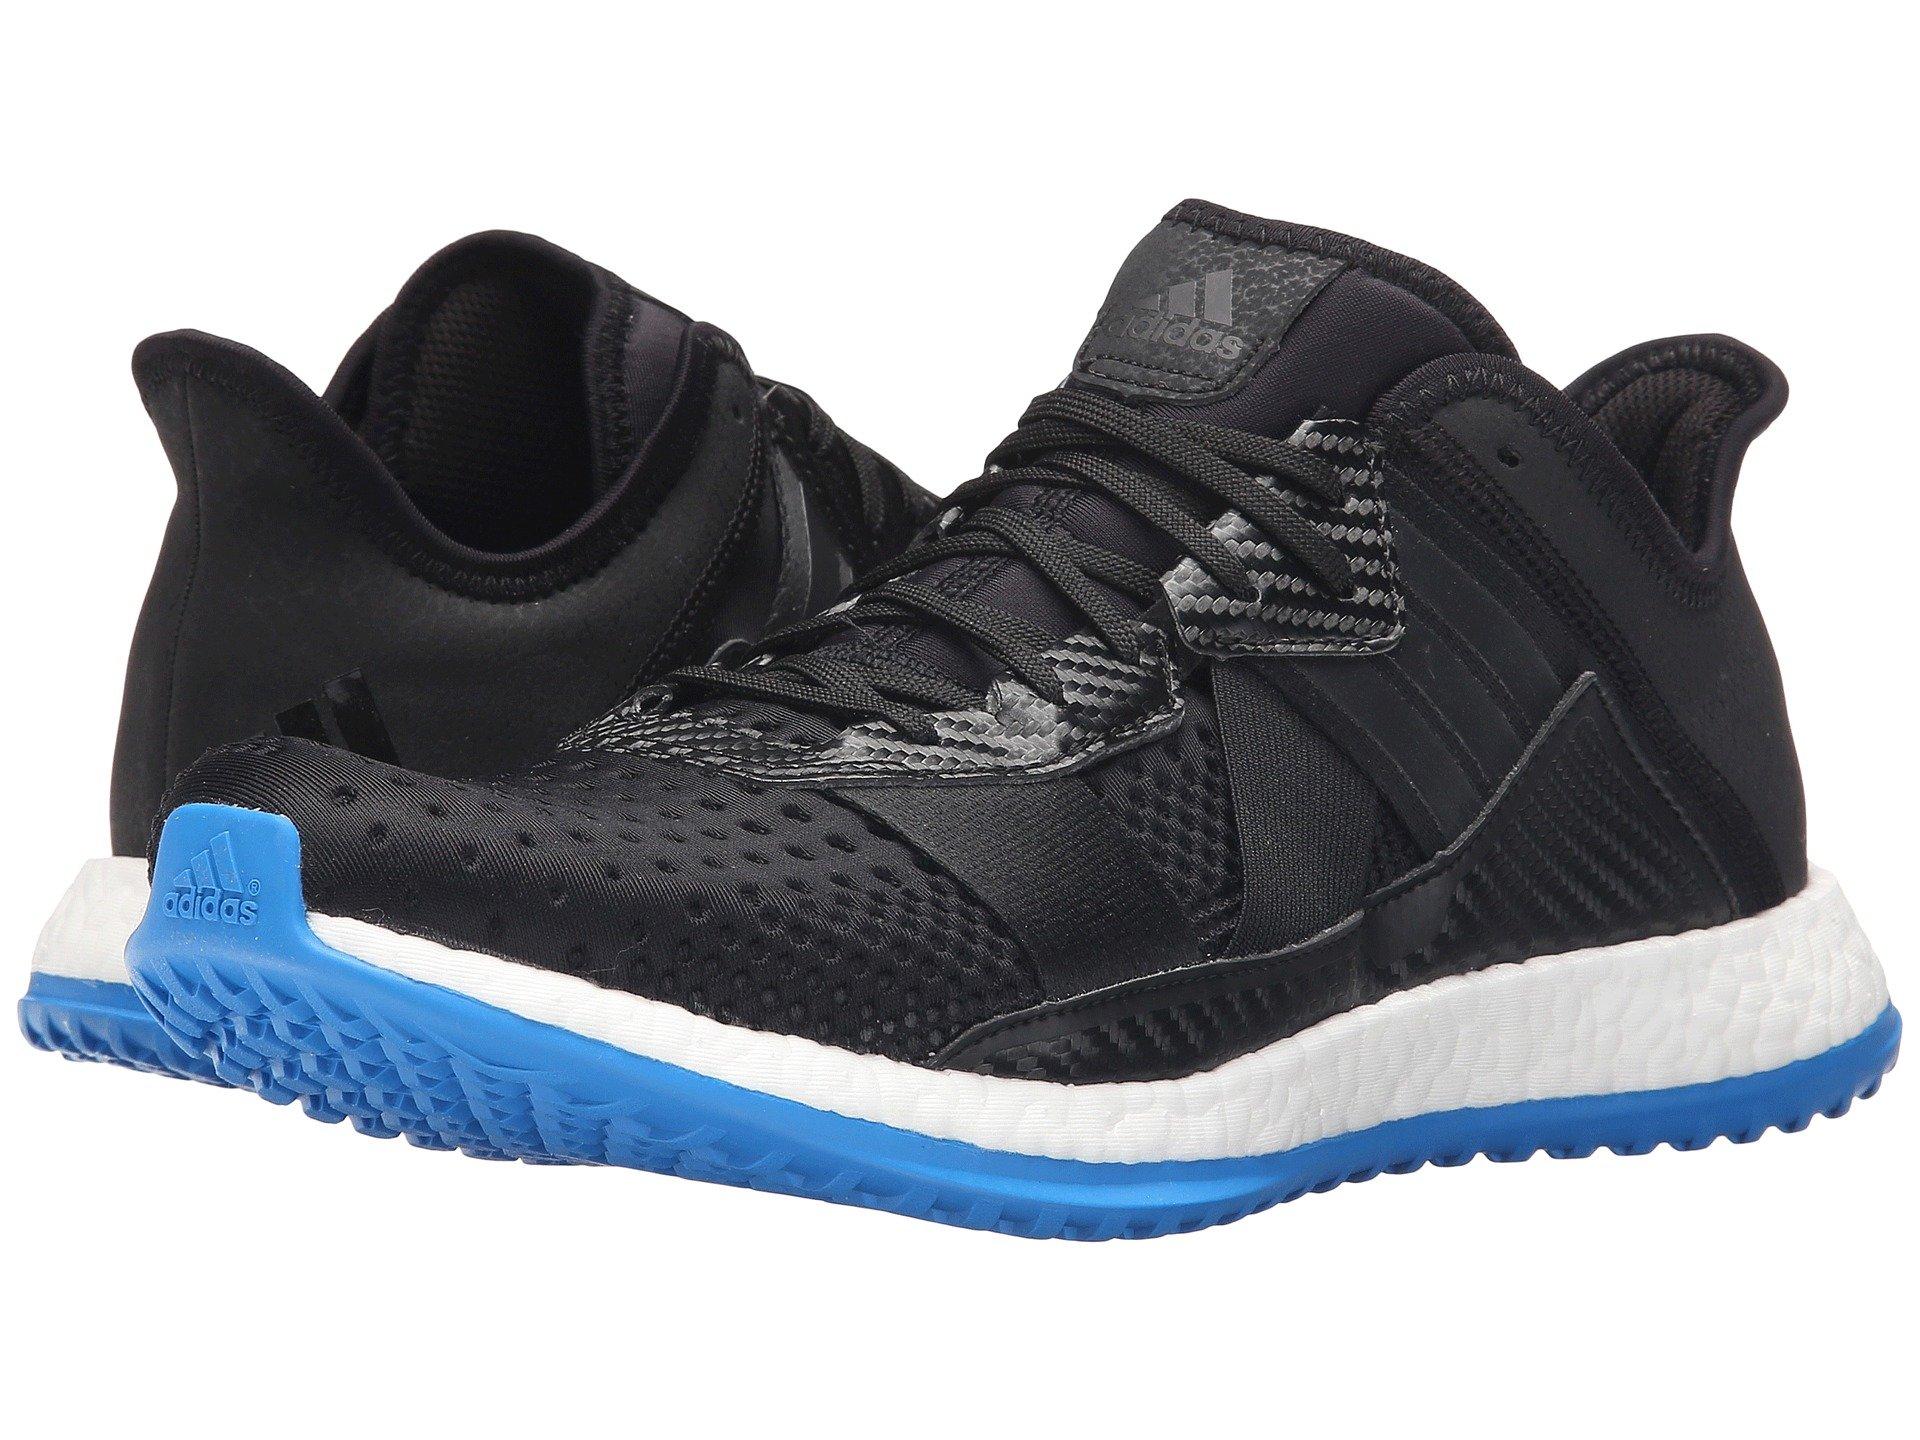 adidas pure boost zg trainer